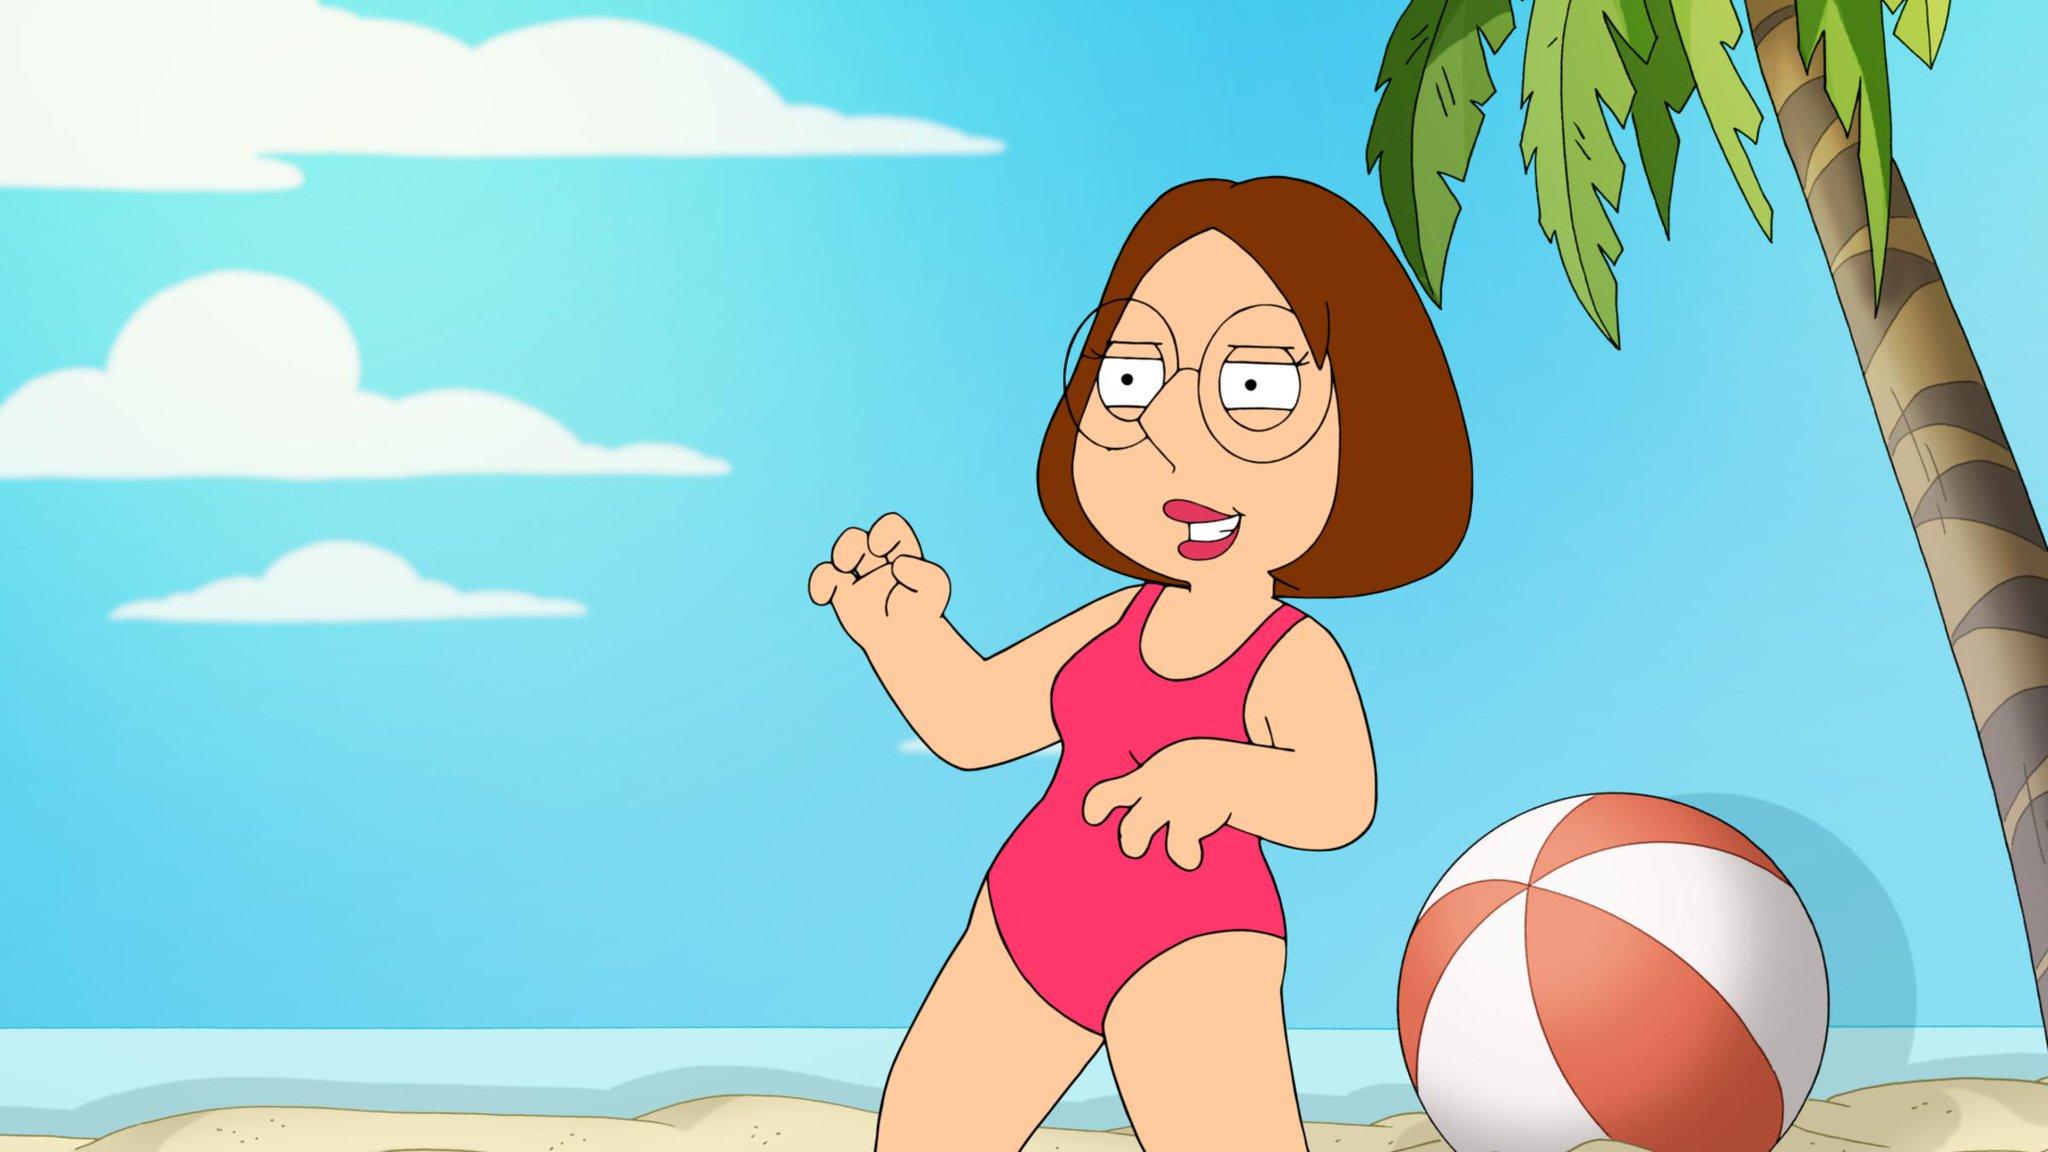 stewie-has-sex-with-little-girl-porn-daniel-radcliffe-porno